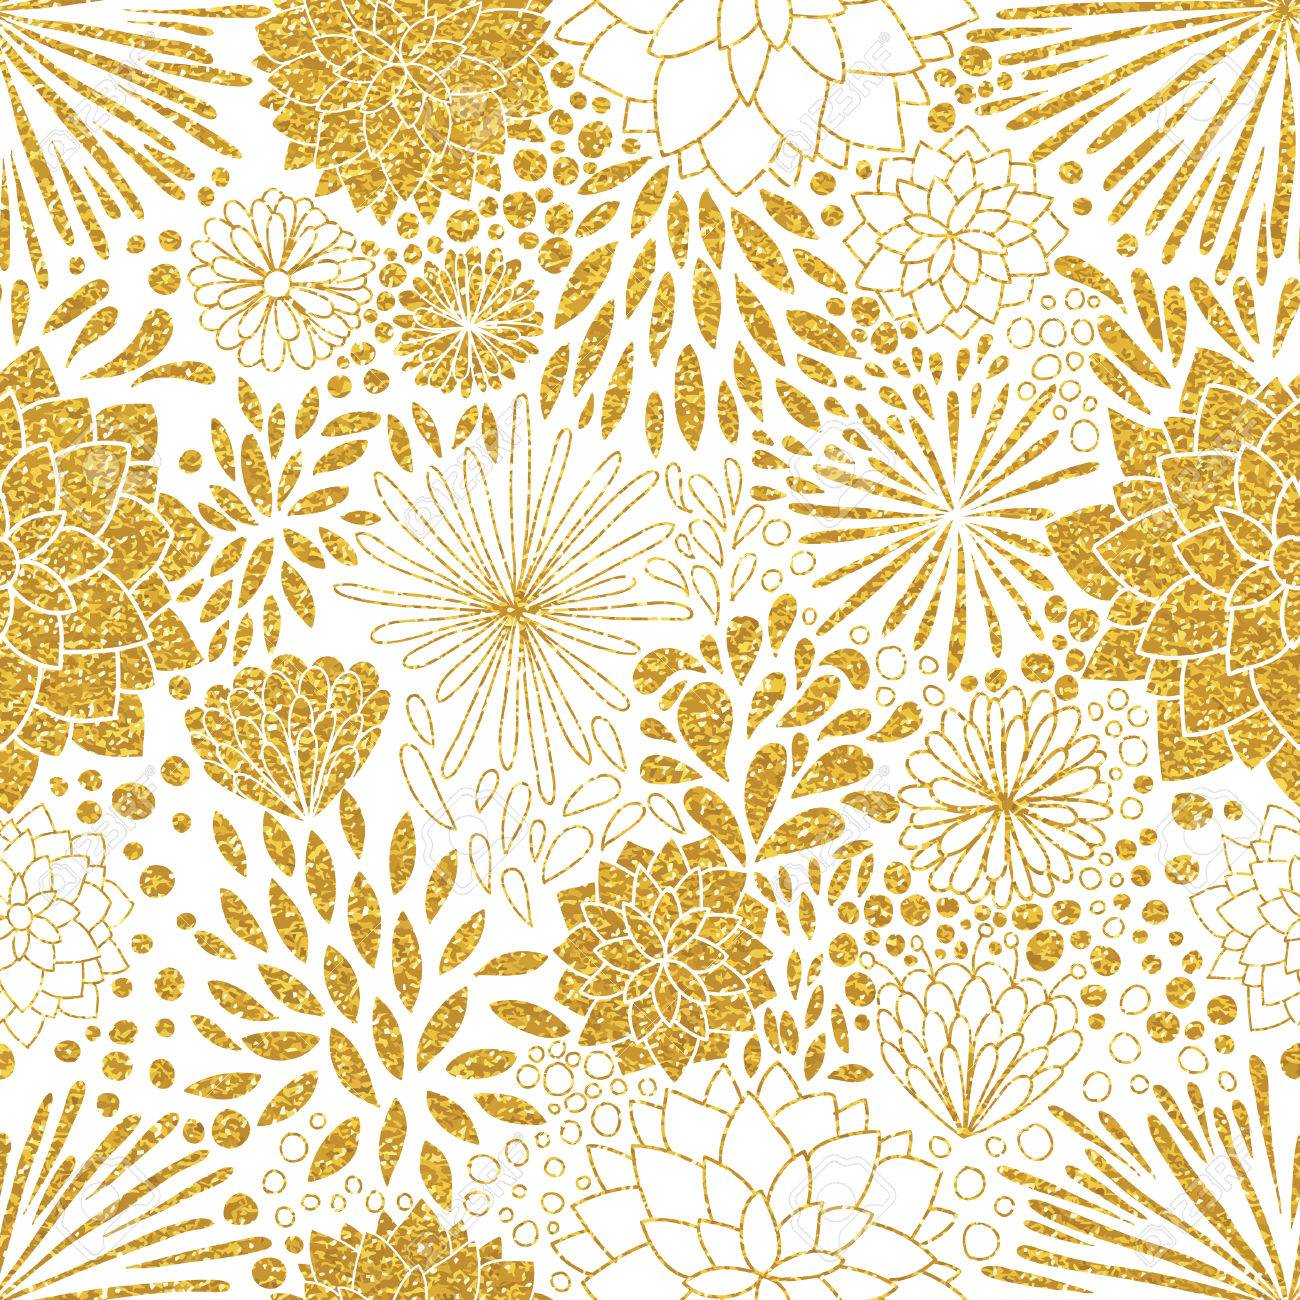 Vector Gold Seamless Patterns. Modern Stylish Texture. Trendy Gold Glitter